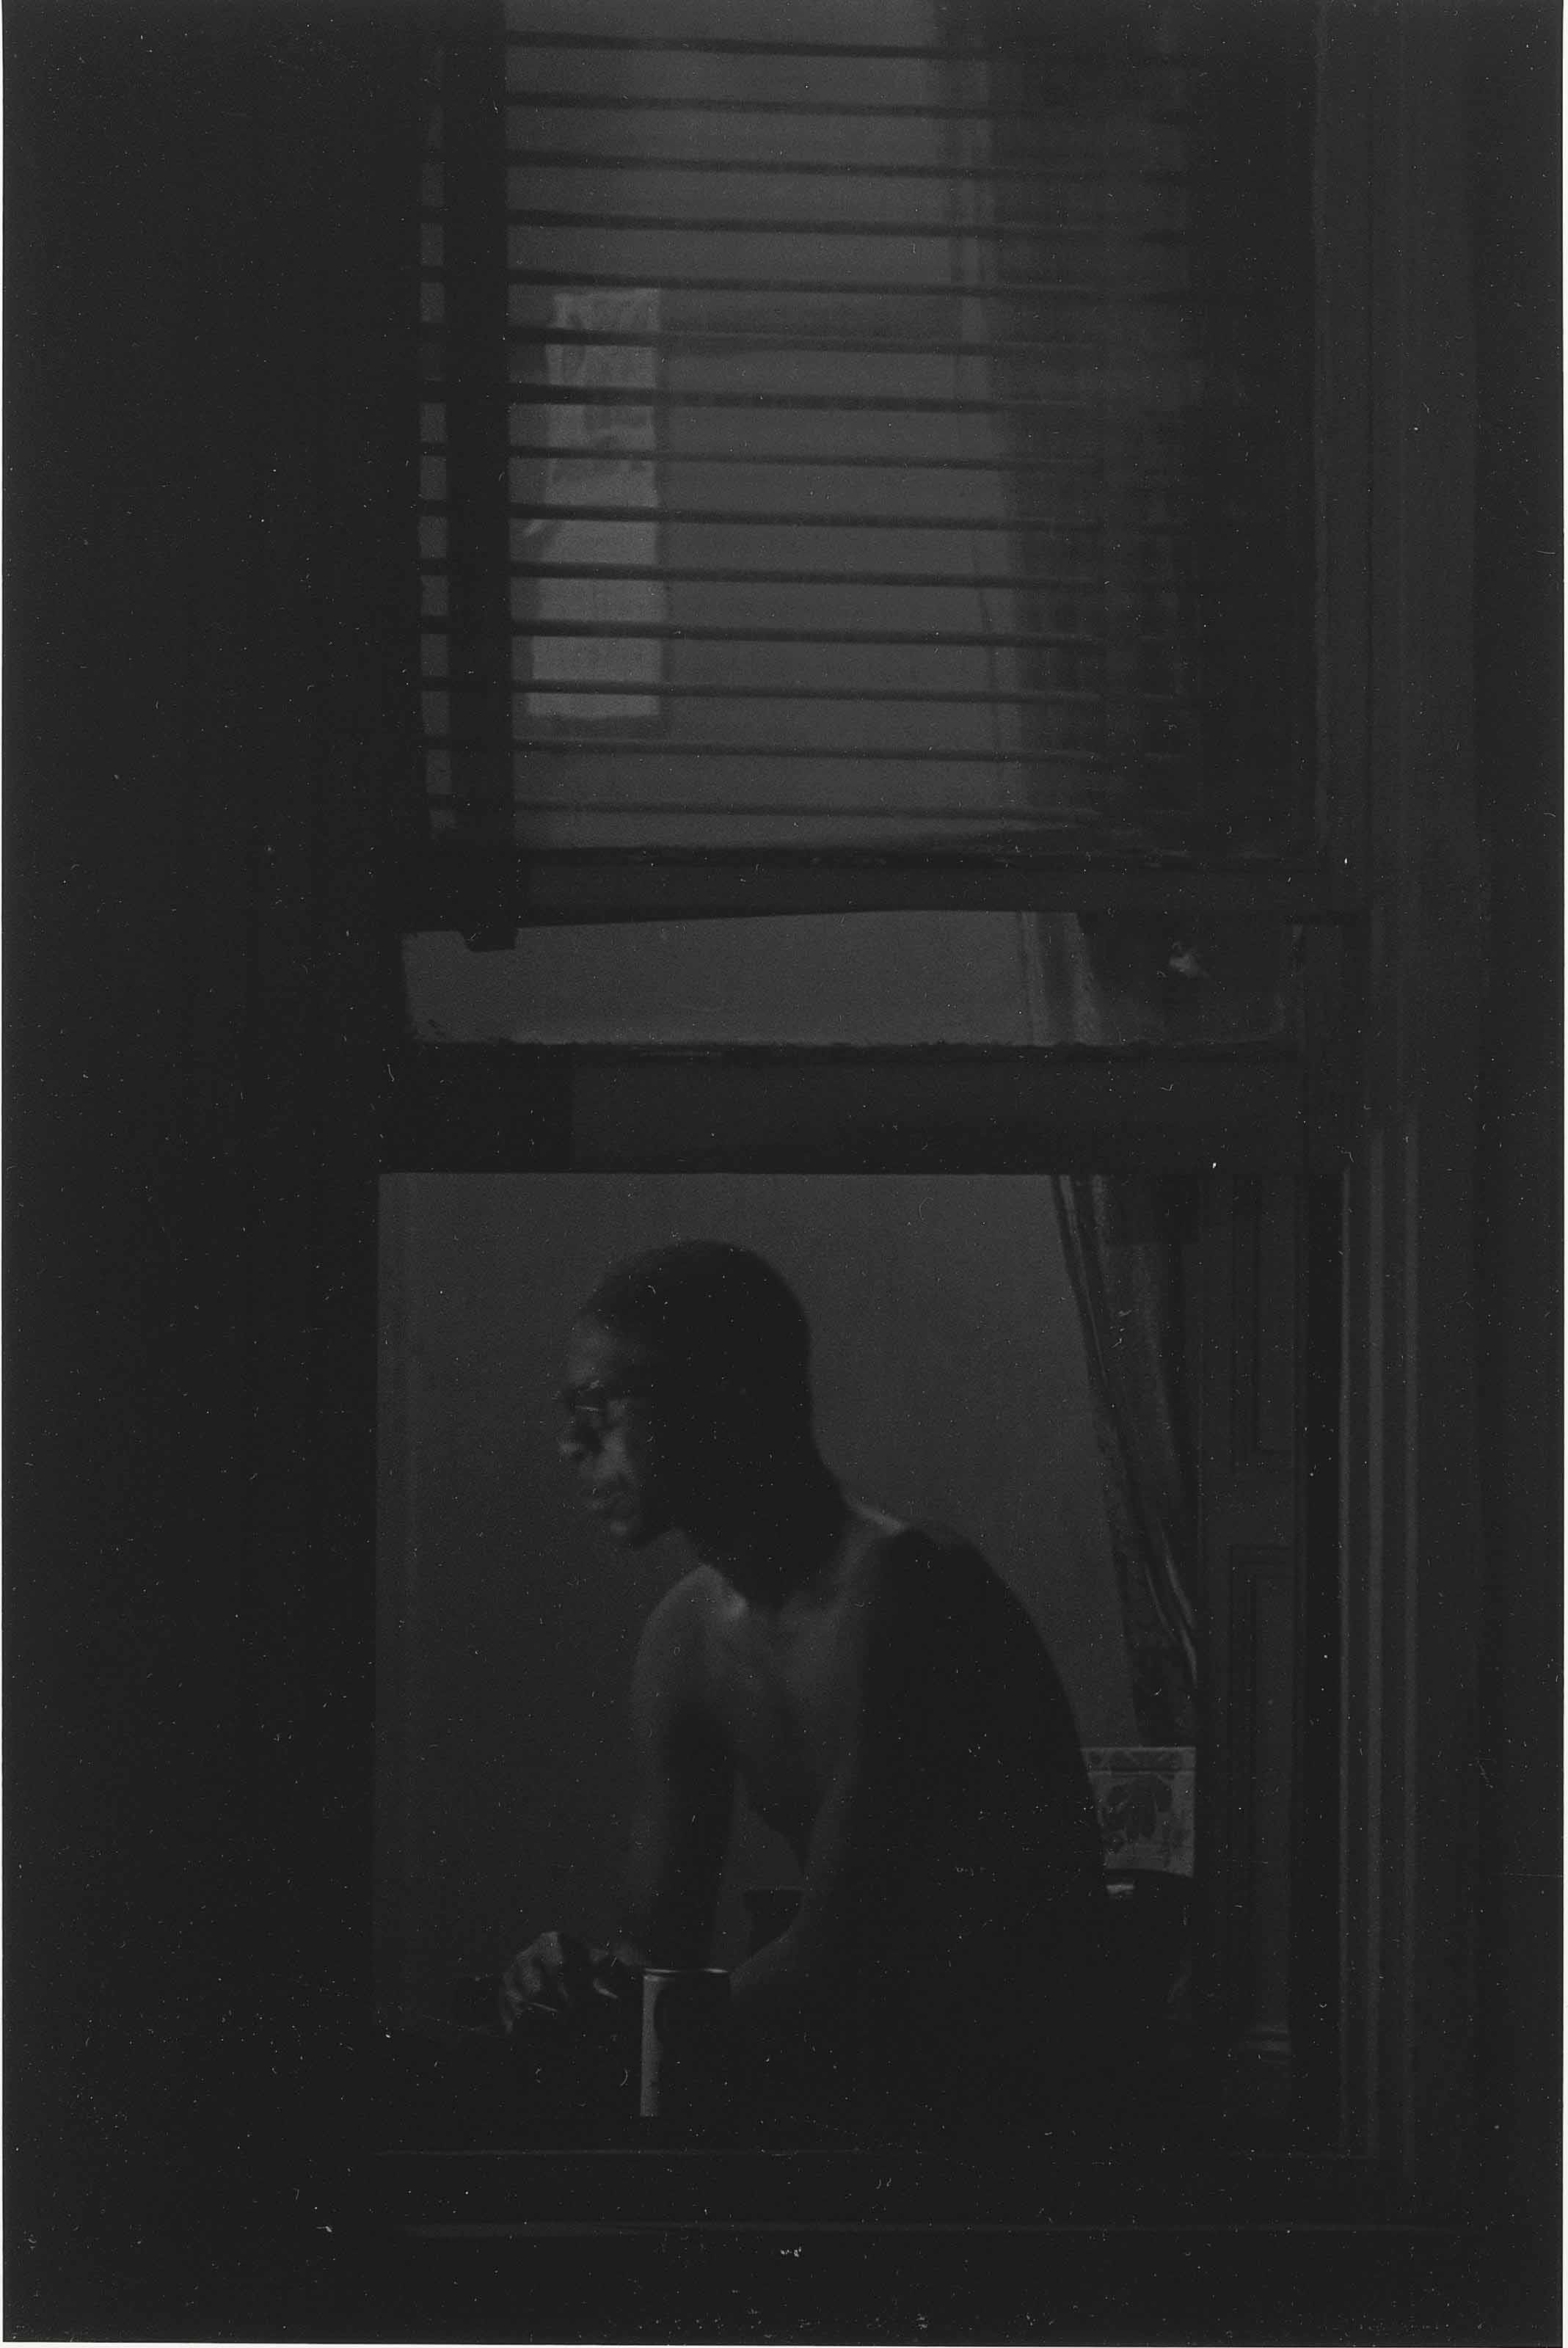 Man in Window, New York, 1978